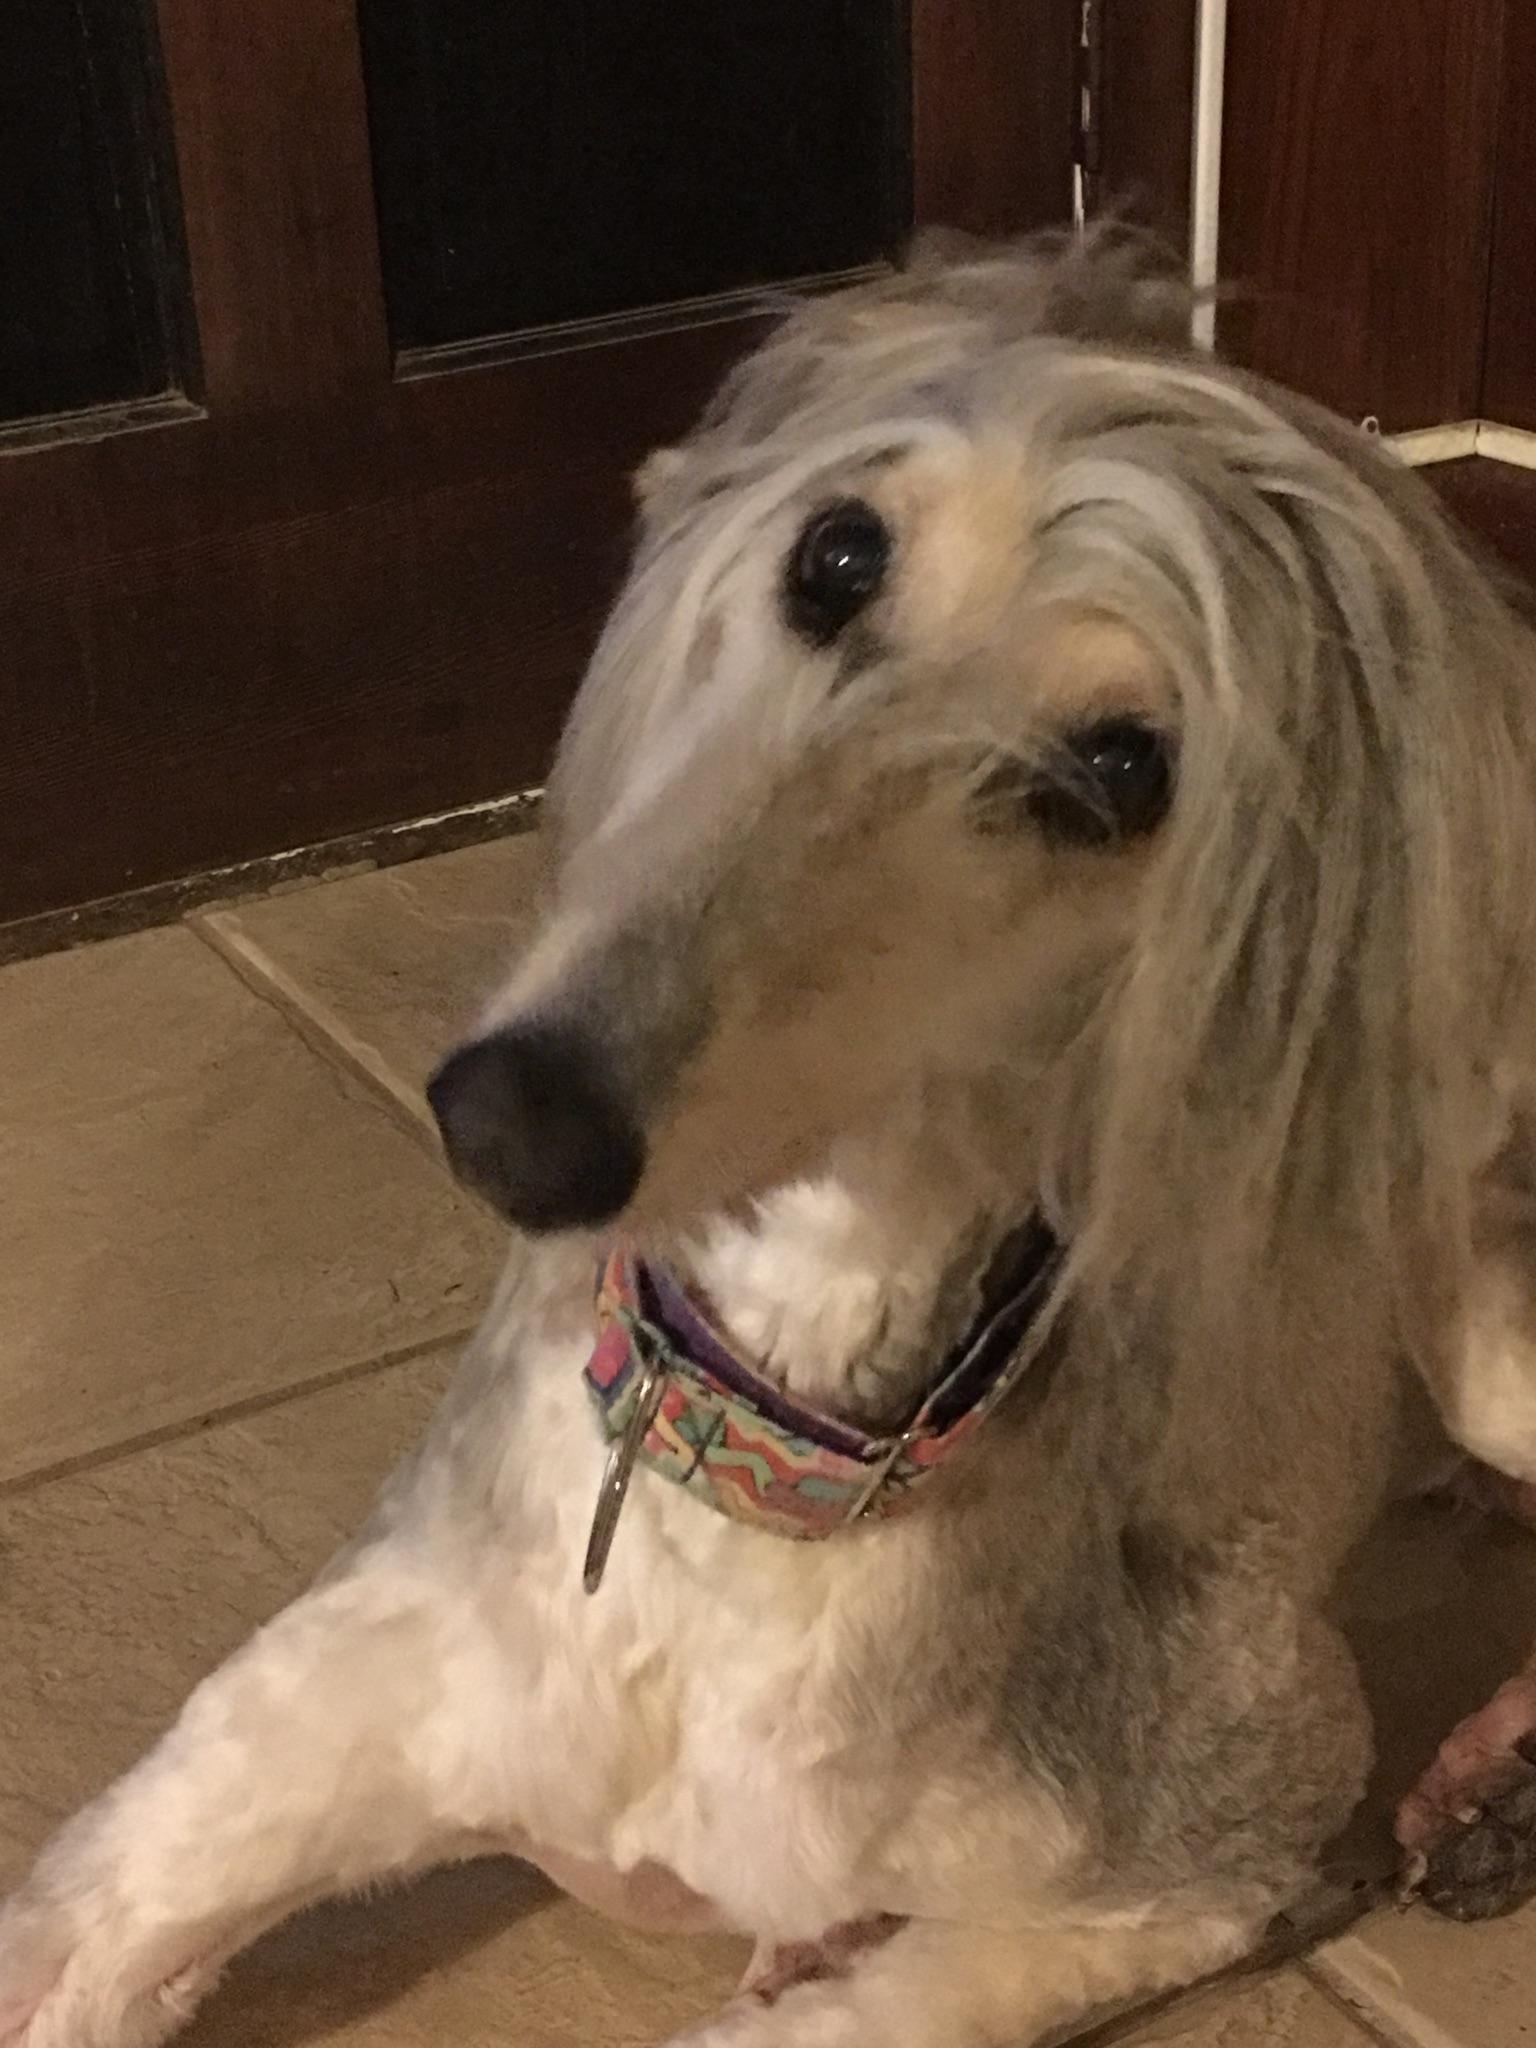 Afghan Hound Craigslist : afghan, hound, craigslist, Adopted, Afghan, Hound, America, National, Rescue